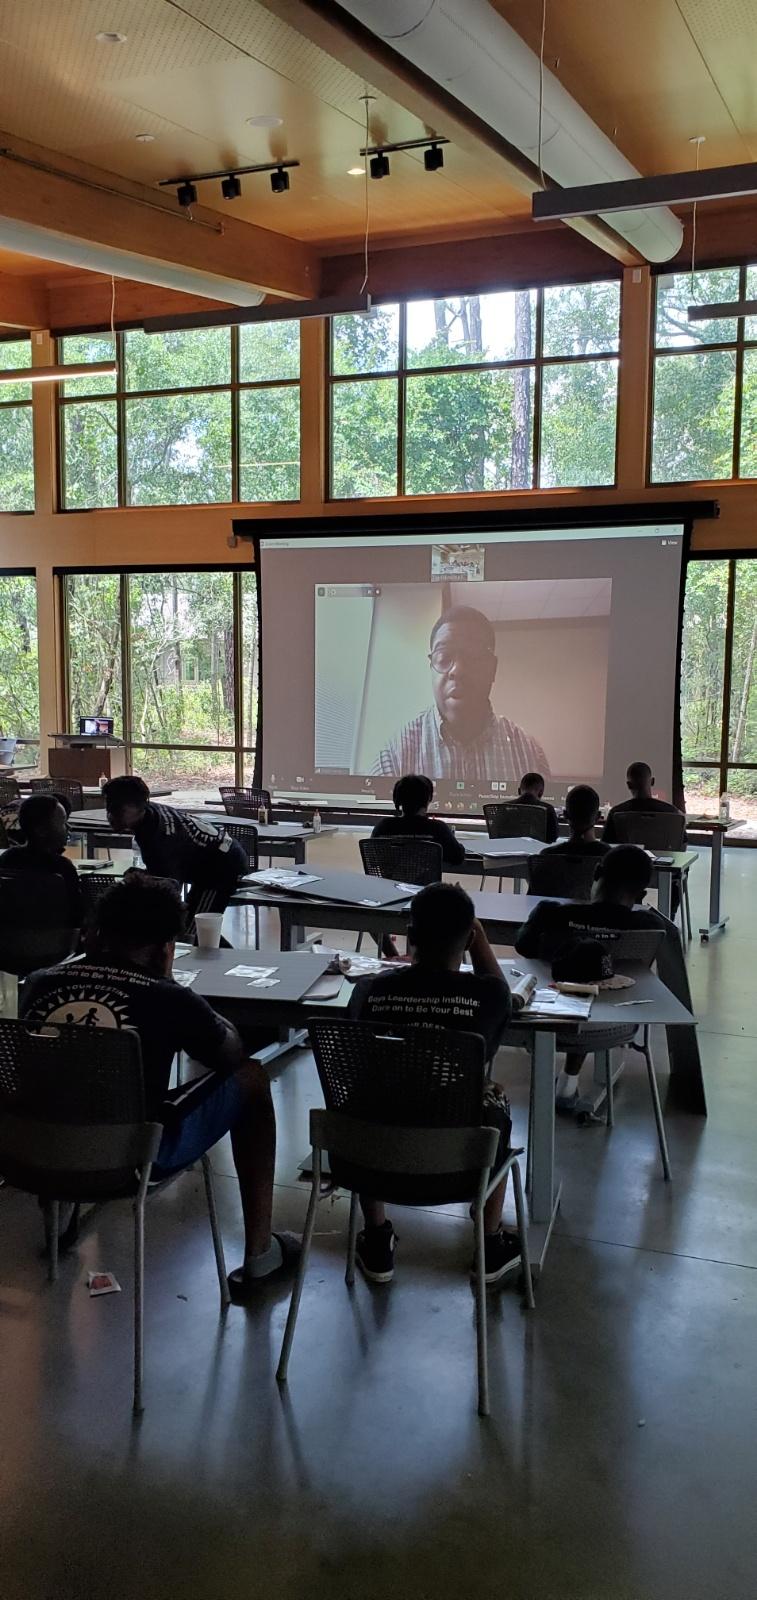 2021 Boys Leadership Institute - The Maynard 4 Foundation 14